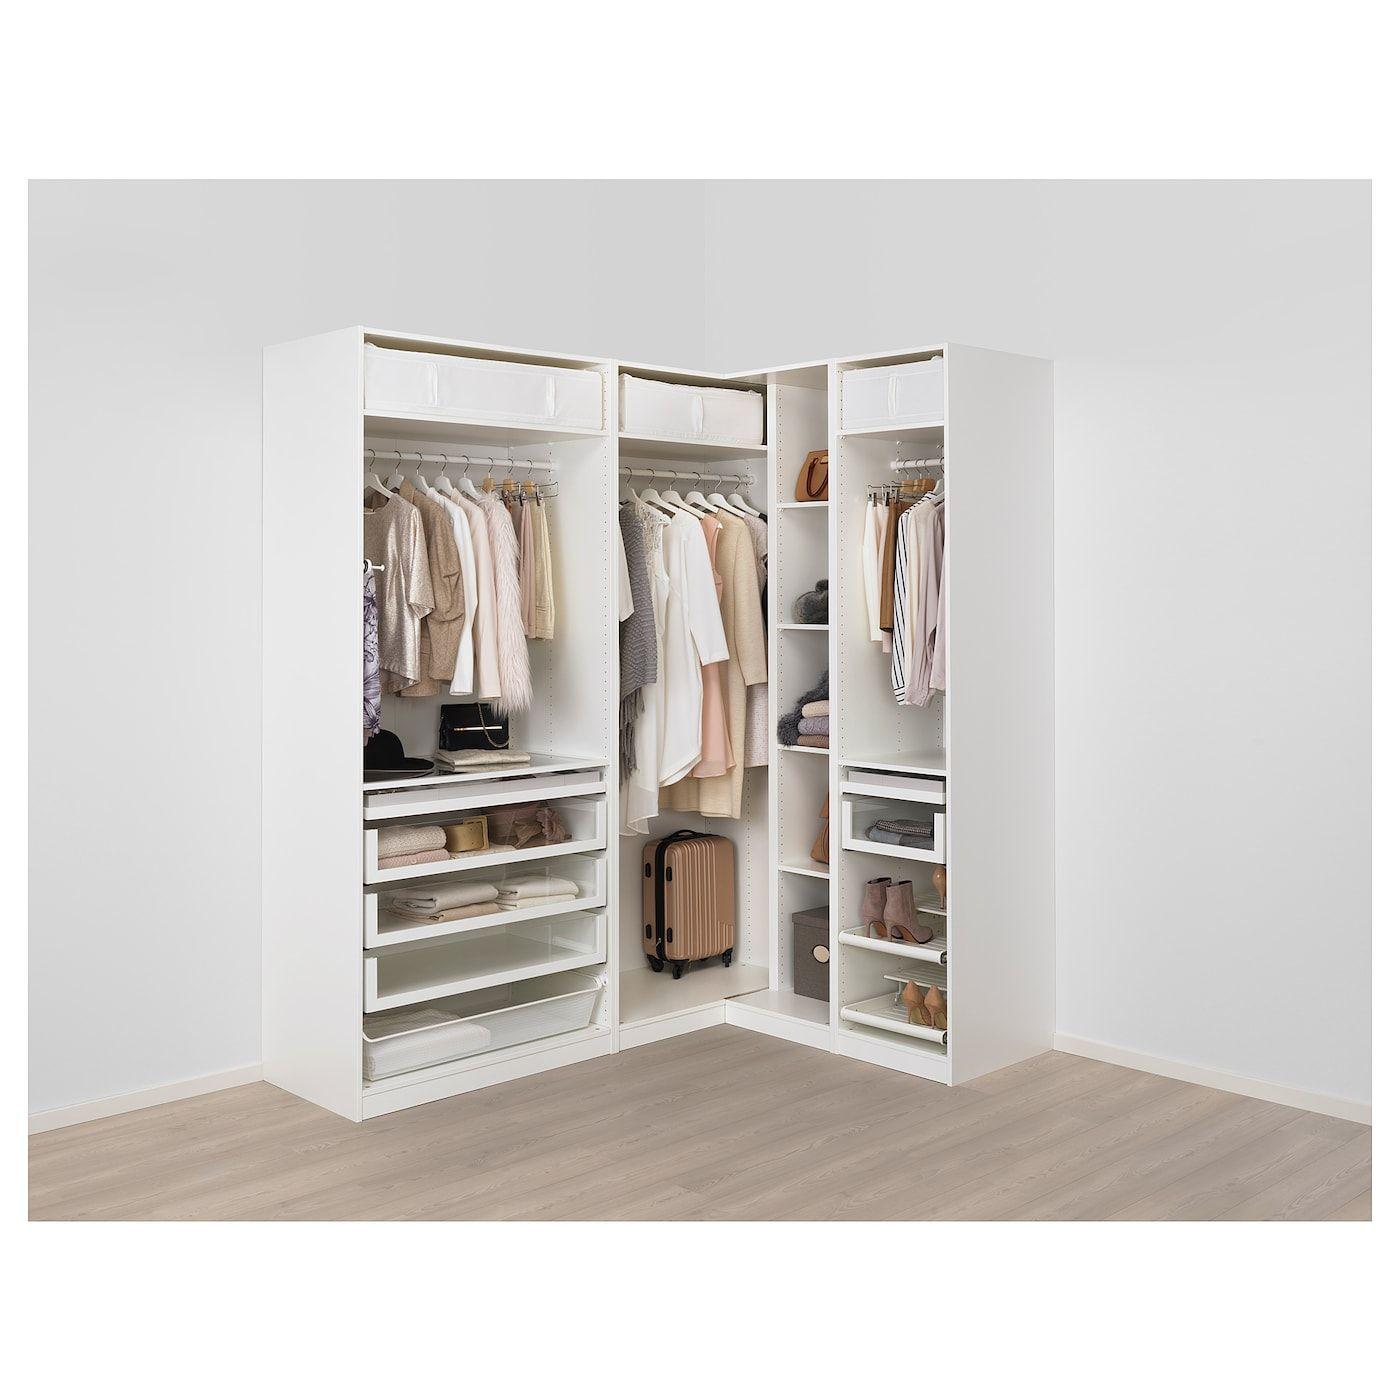 Armoire D Angle Dressing pax corner wardrobe - white, reinsvoll gray-green 82 3/4/63